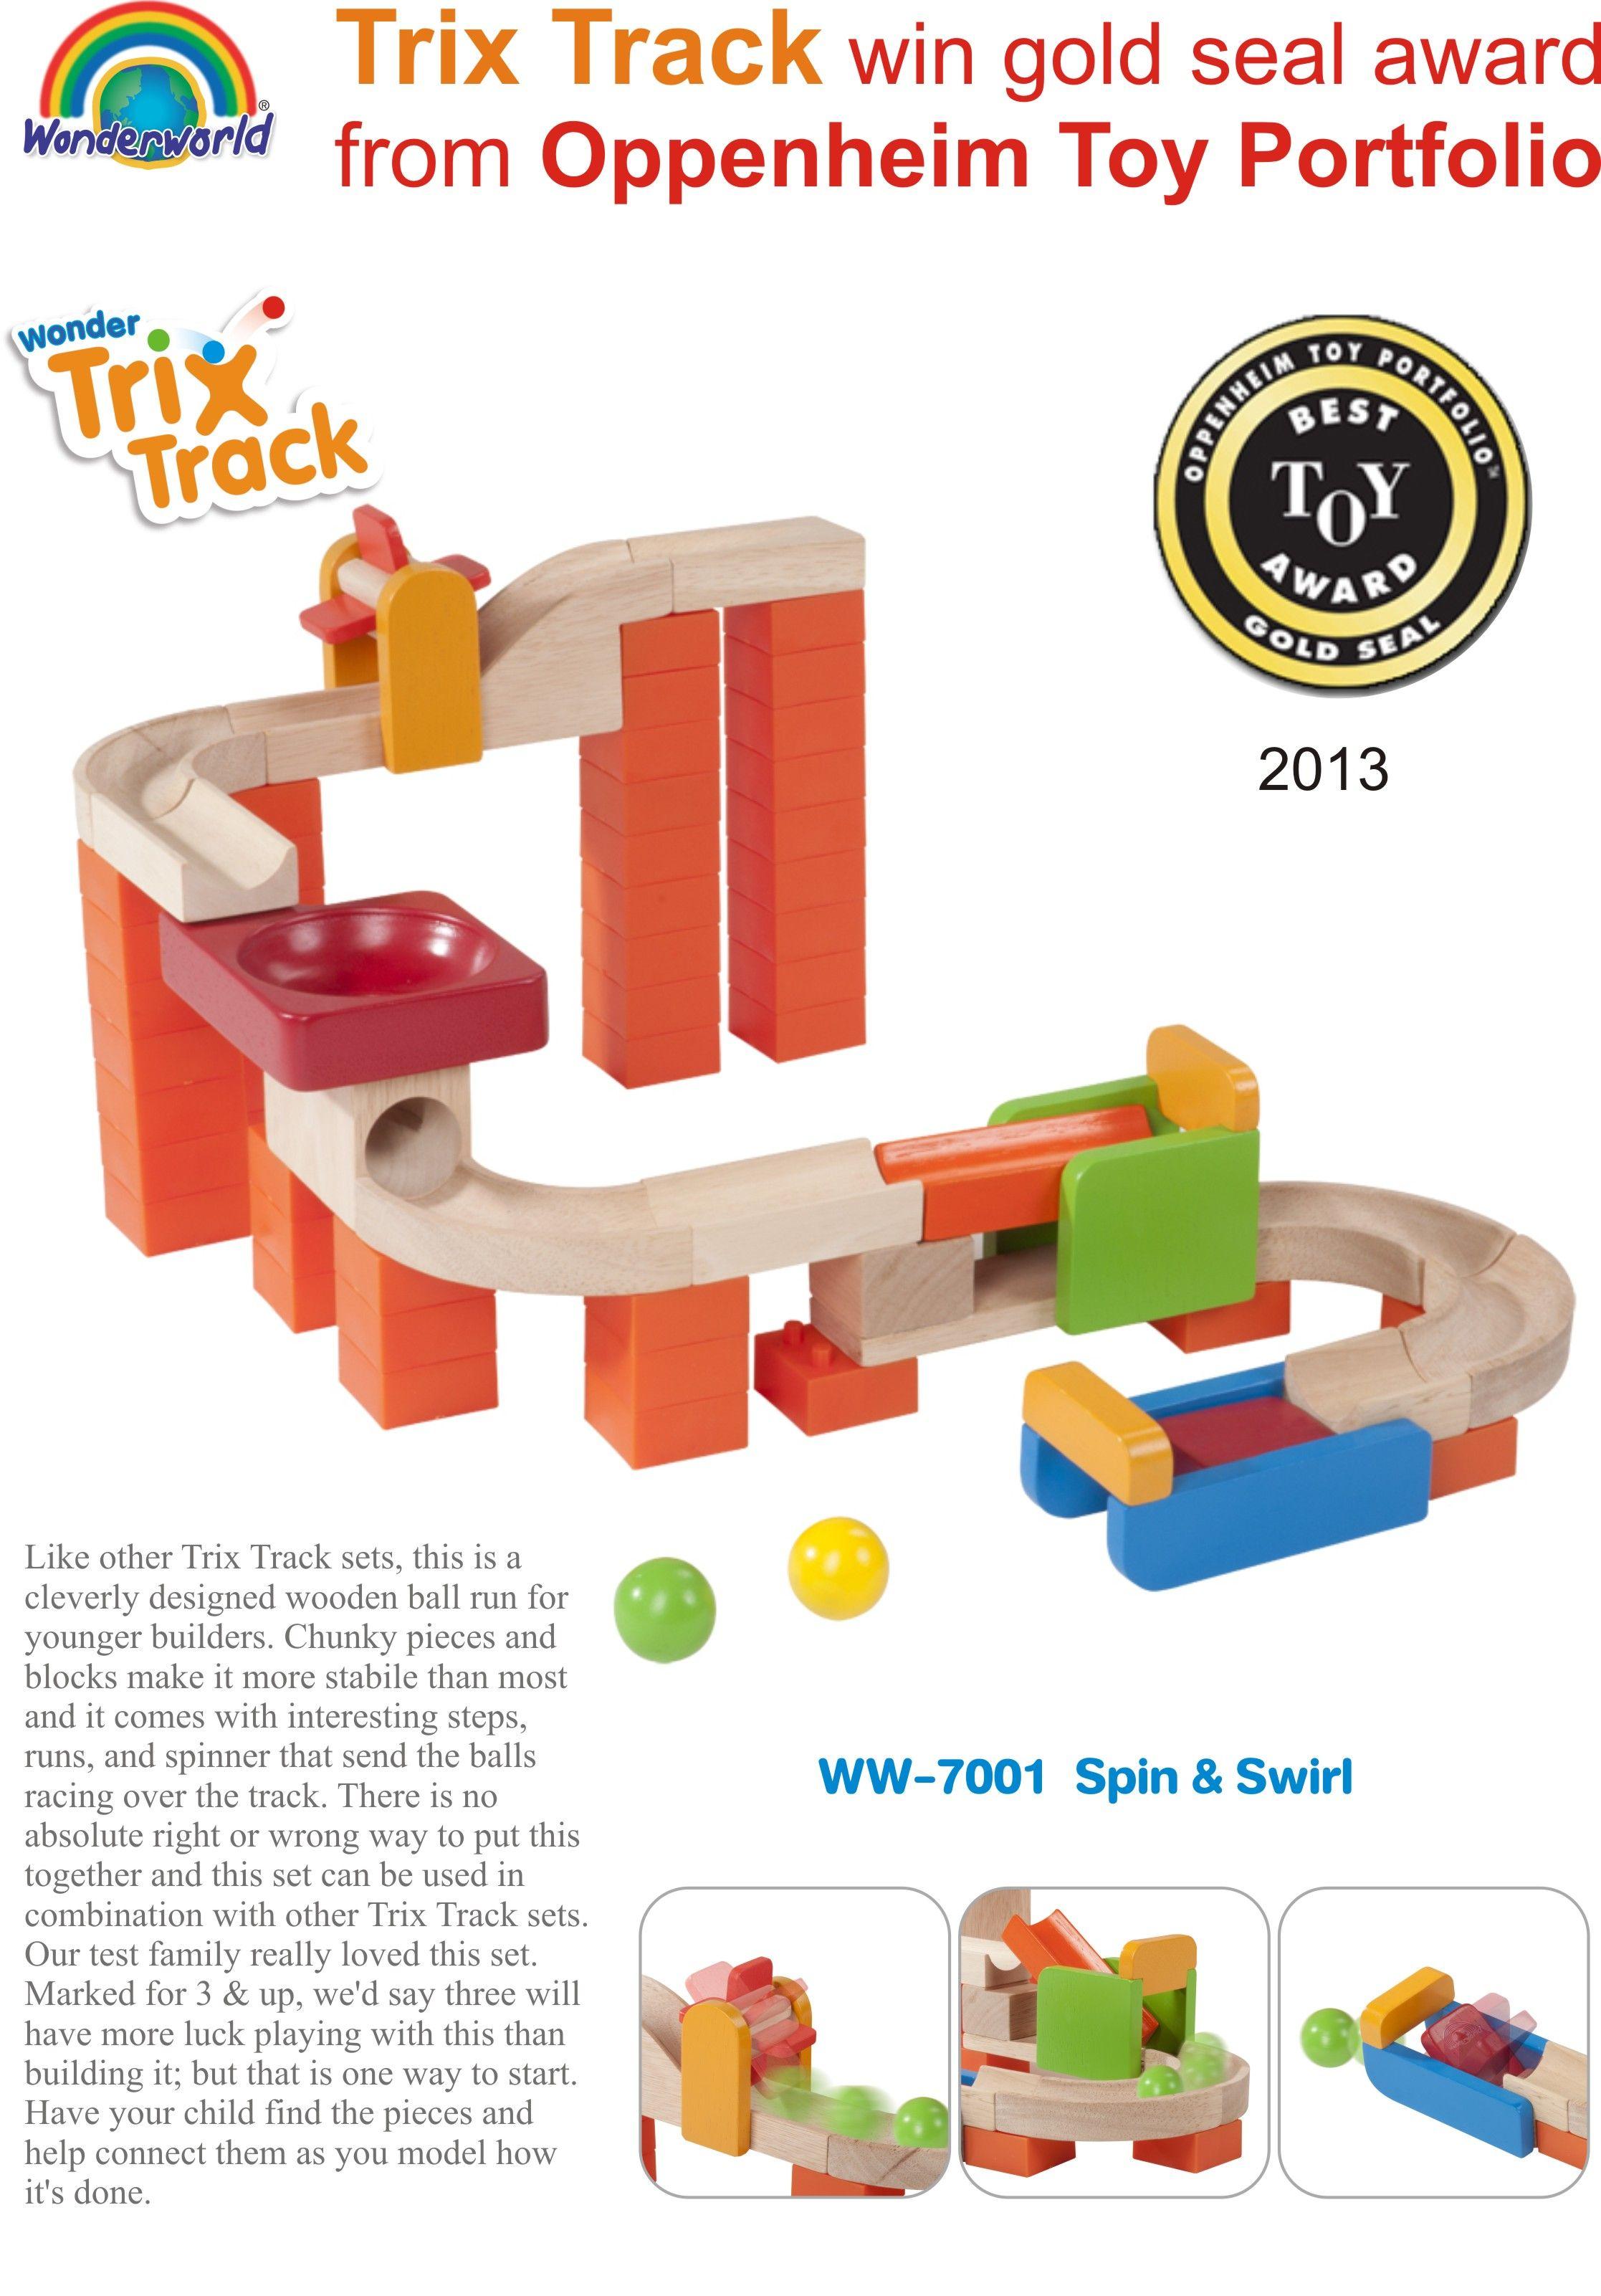 International Toy Awards #wonderworldtoy #oppenheim #goldsealaward